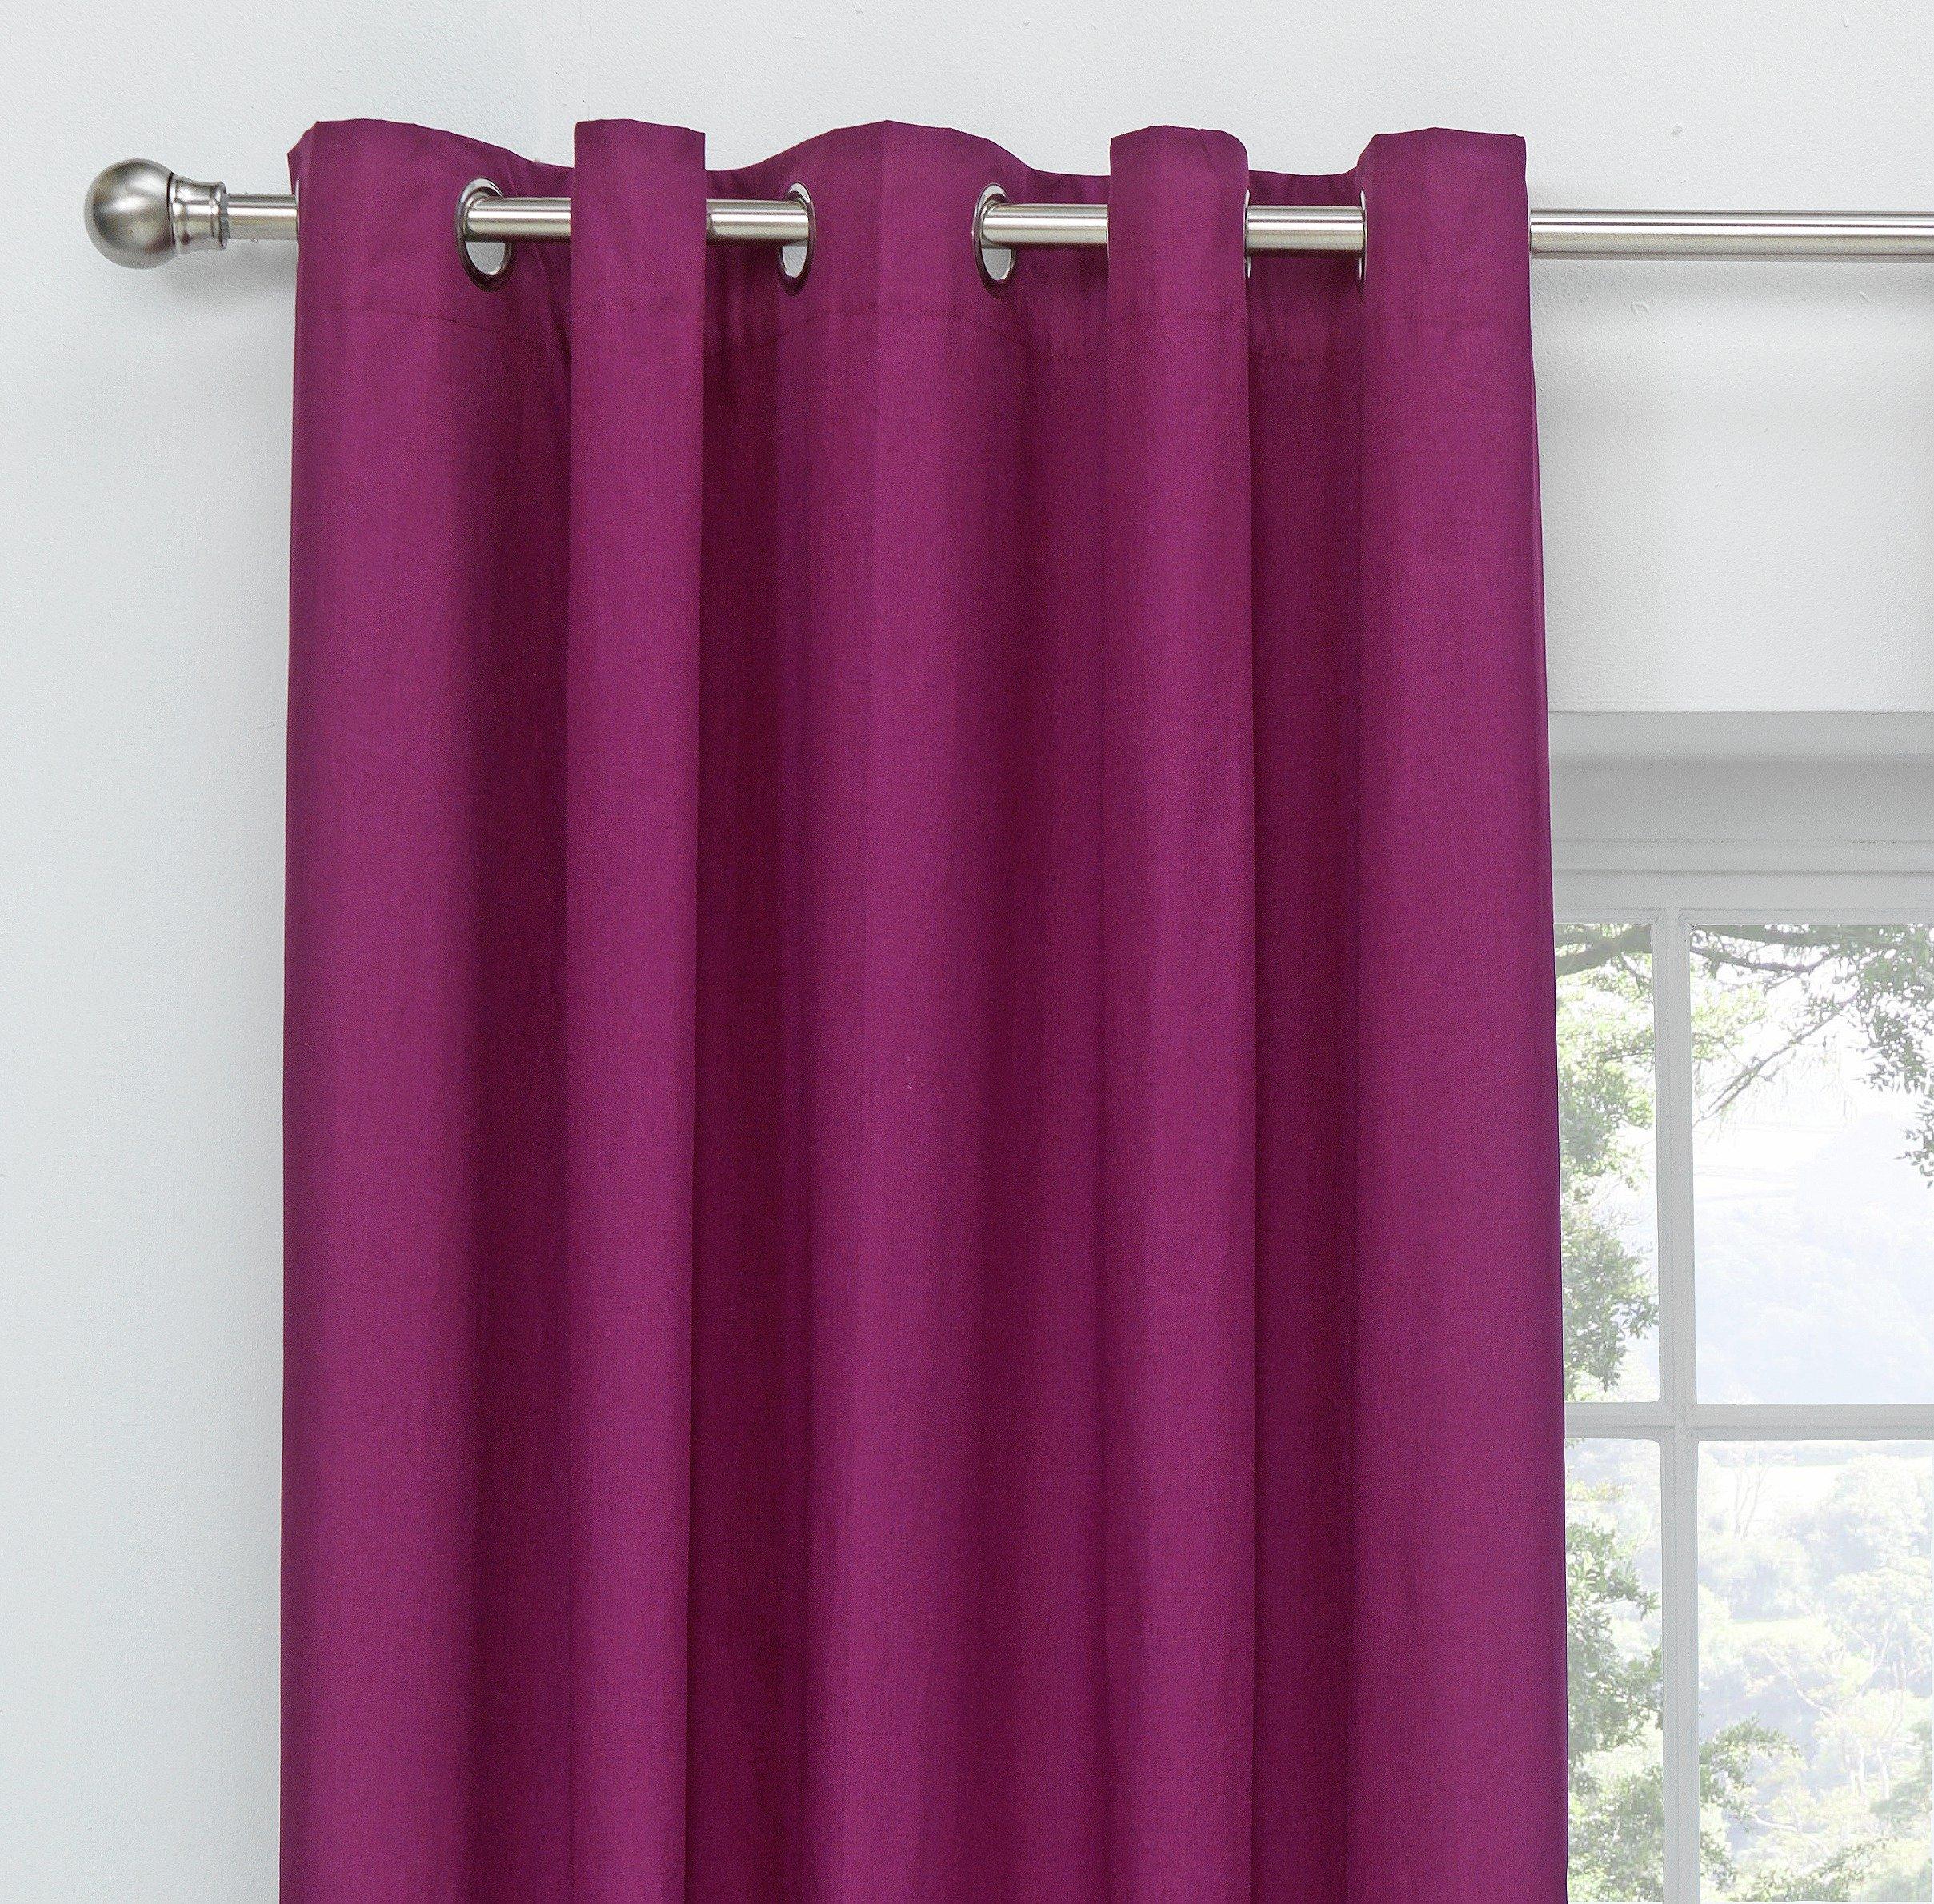 Image of ColourMatch Blackout Eyelet Curtains - 229x229cm - Grape